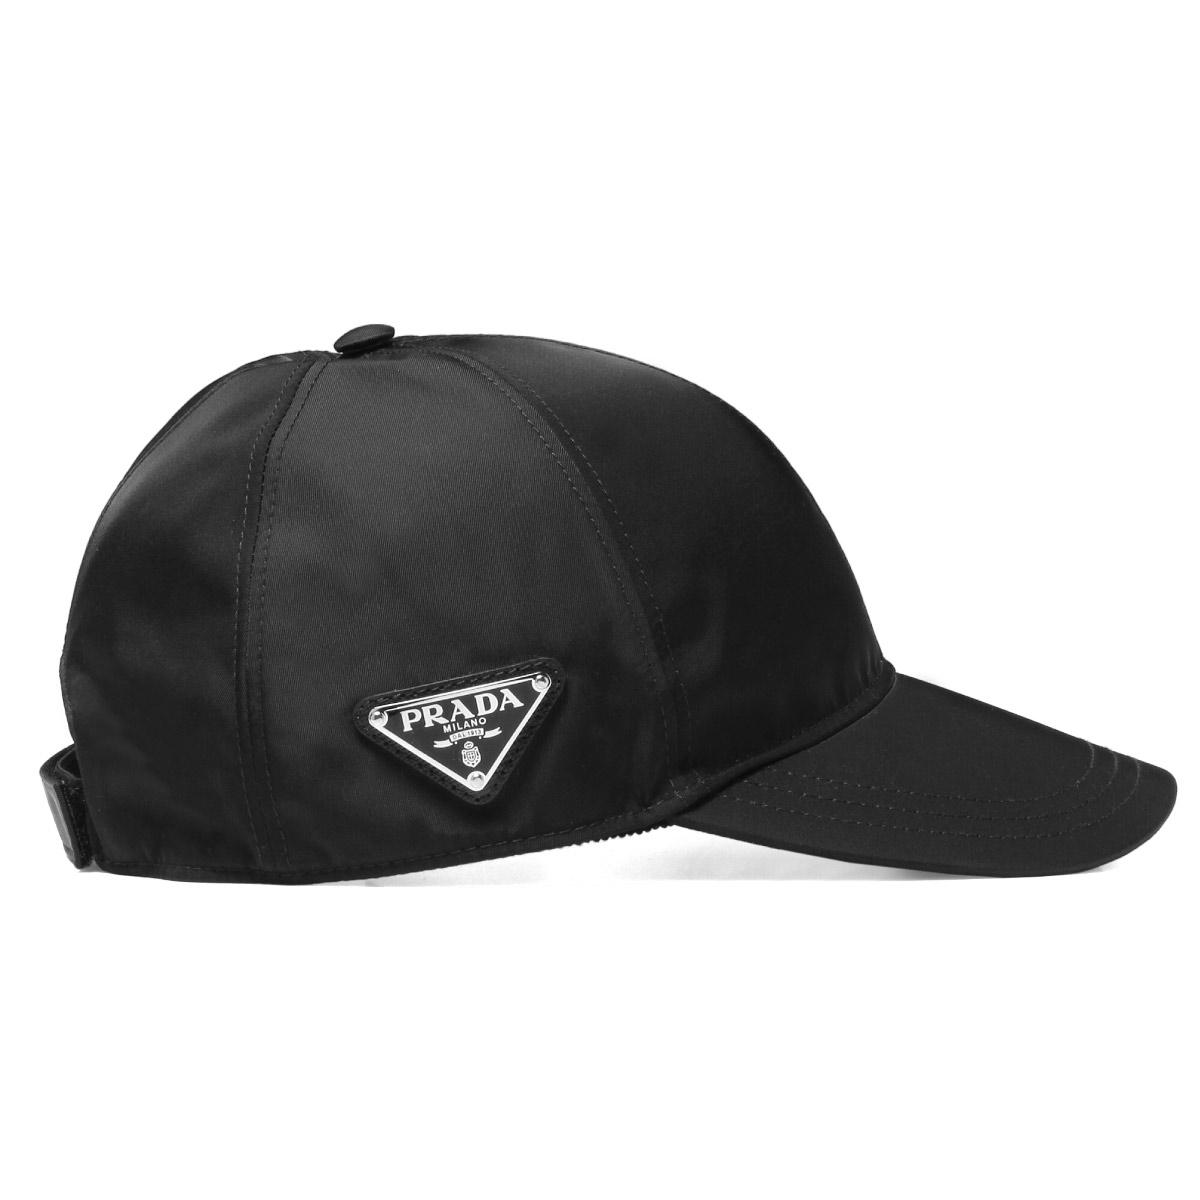 f0a067e4 importshopdouble: Prada PRADA cap Lady's 1HC274 2B15 F0002 NERO black |  Rakuten Global Market